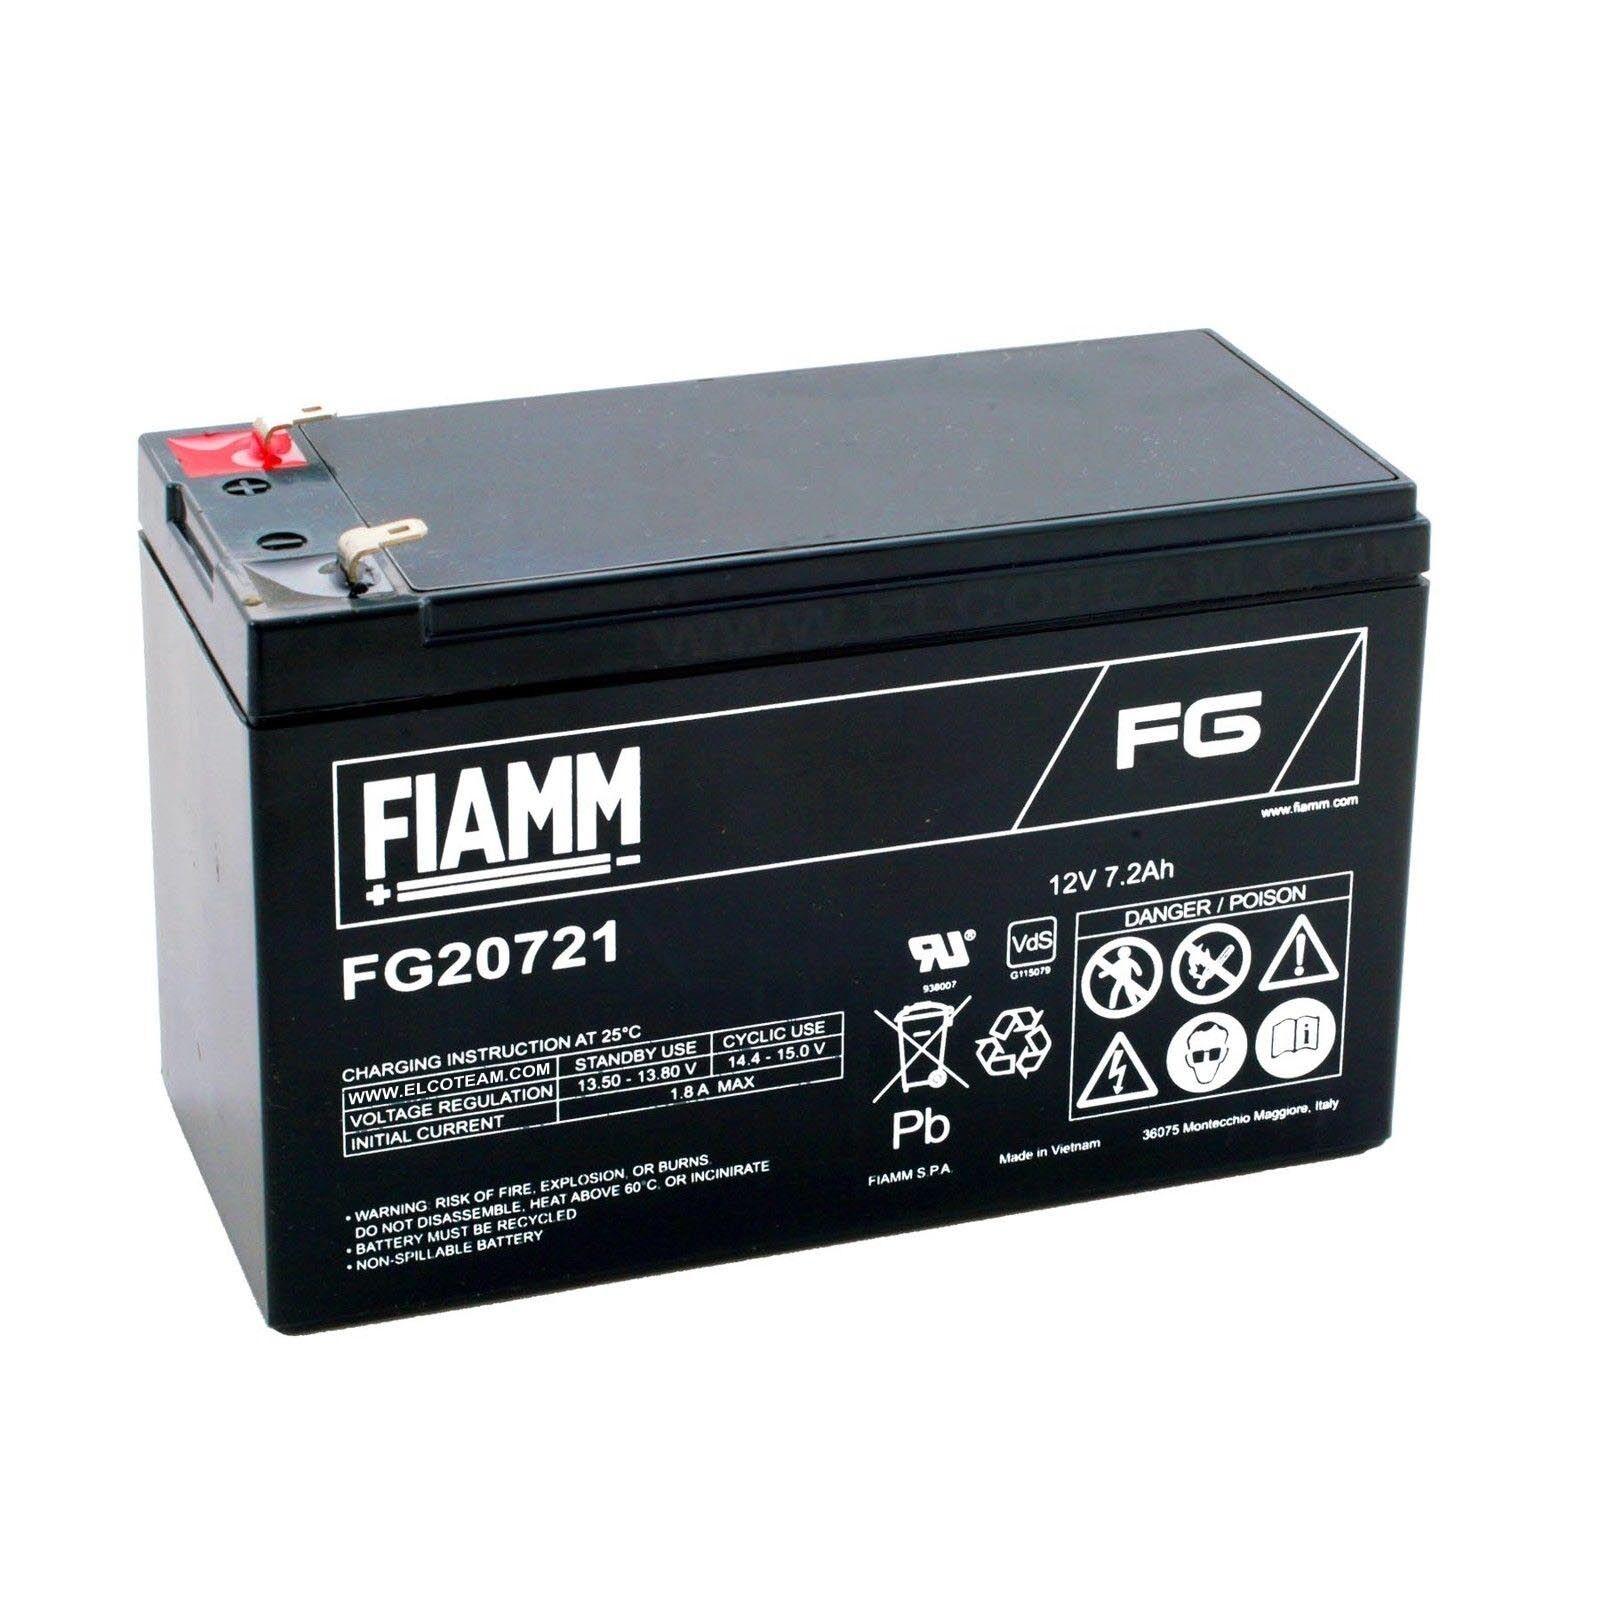 Fiamm FG20721 Batteria al piombo ricaricabile 12V 7,2Ah faston 4,8mm FIAMM